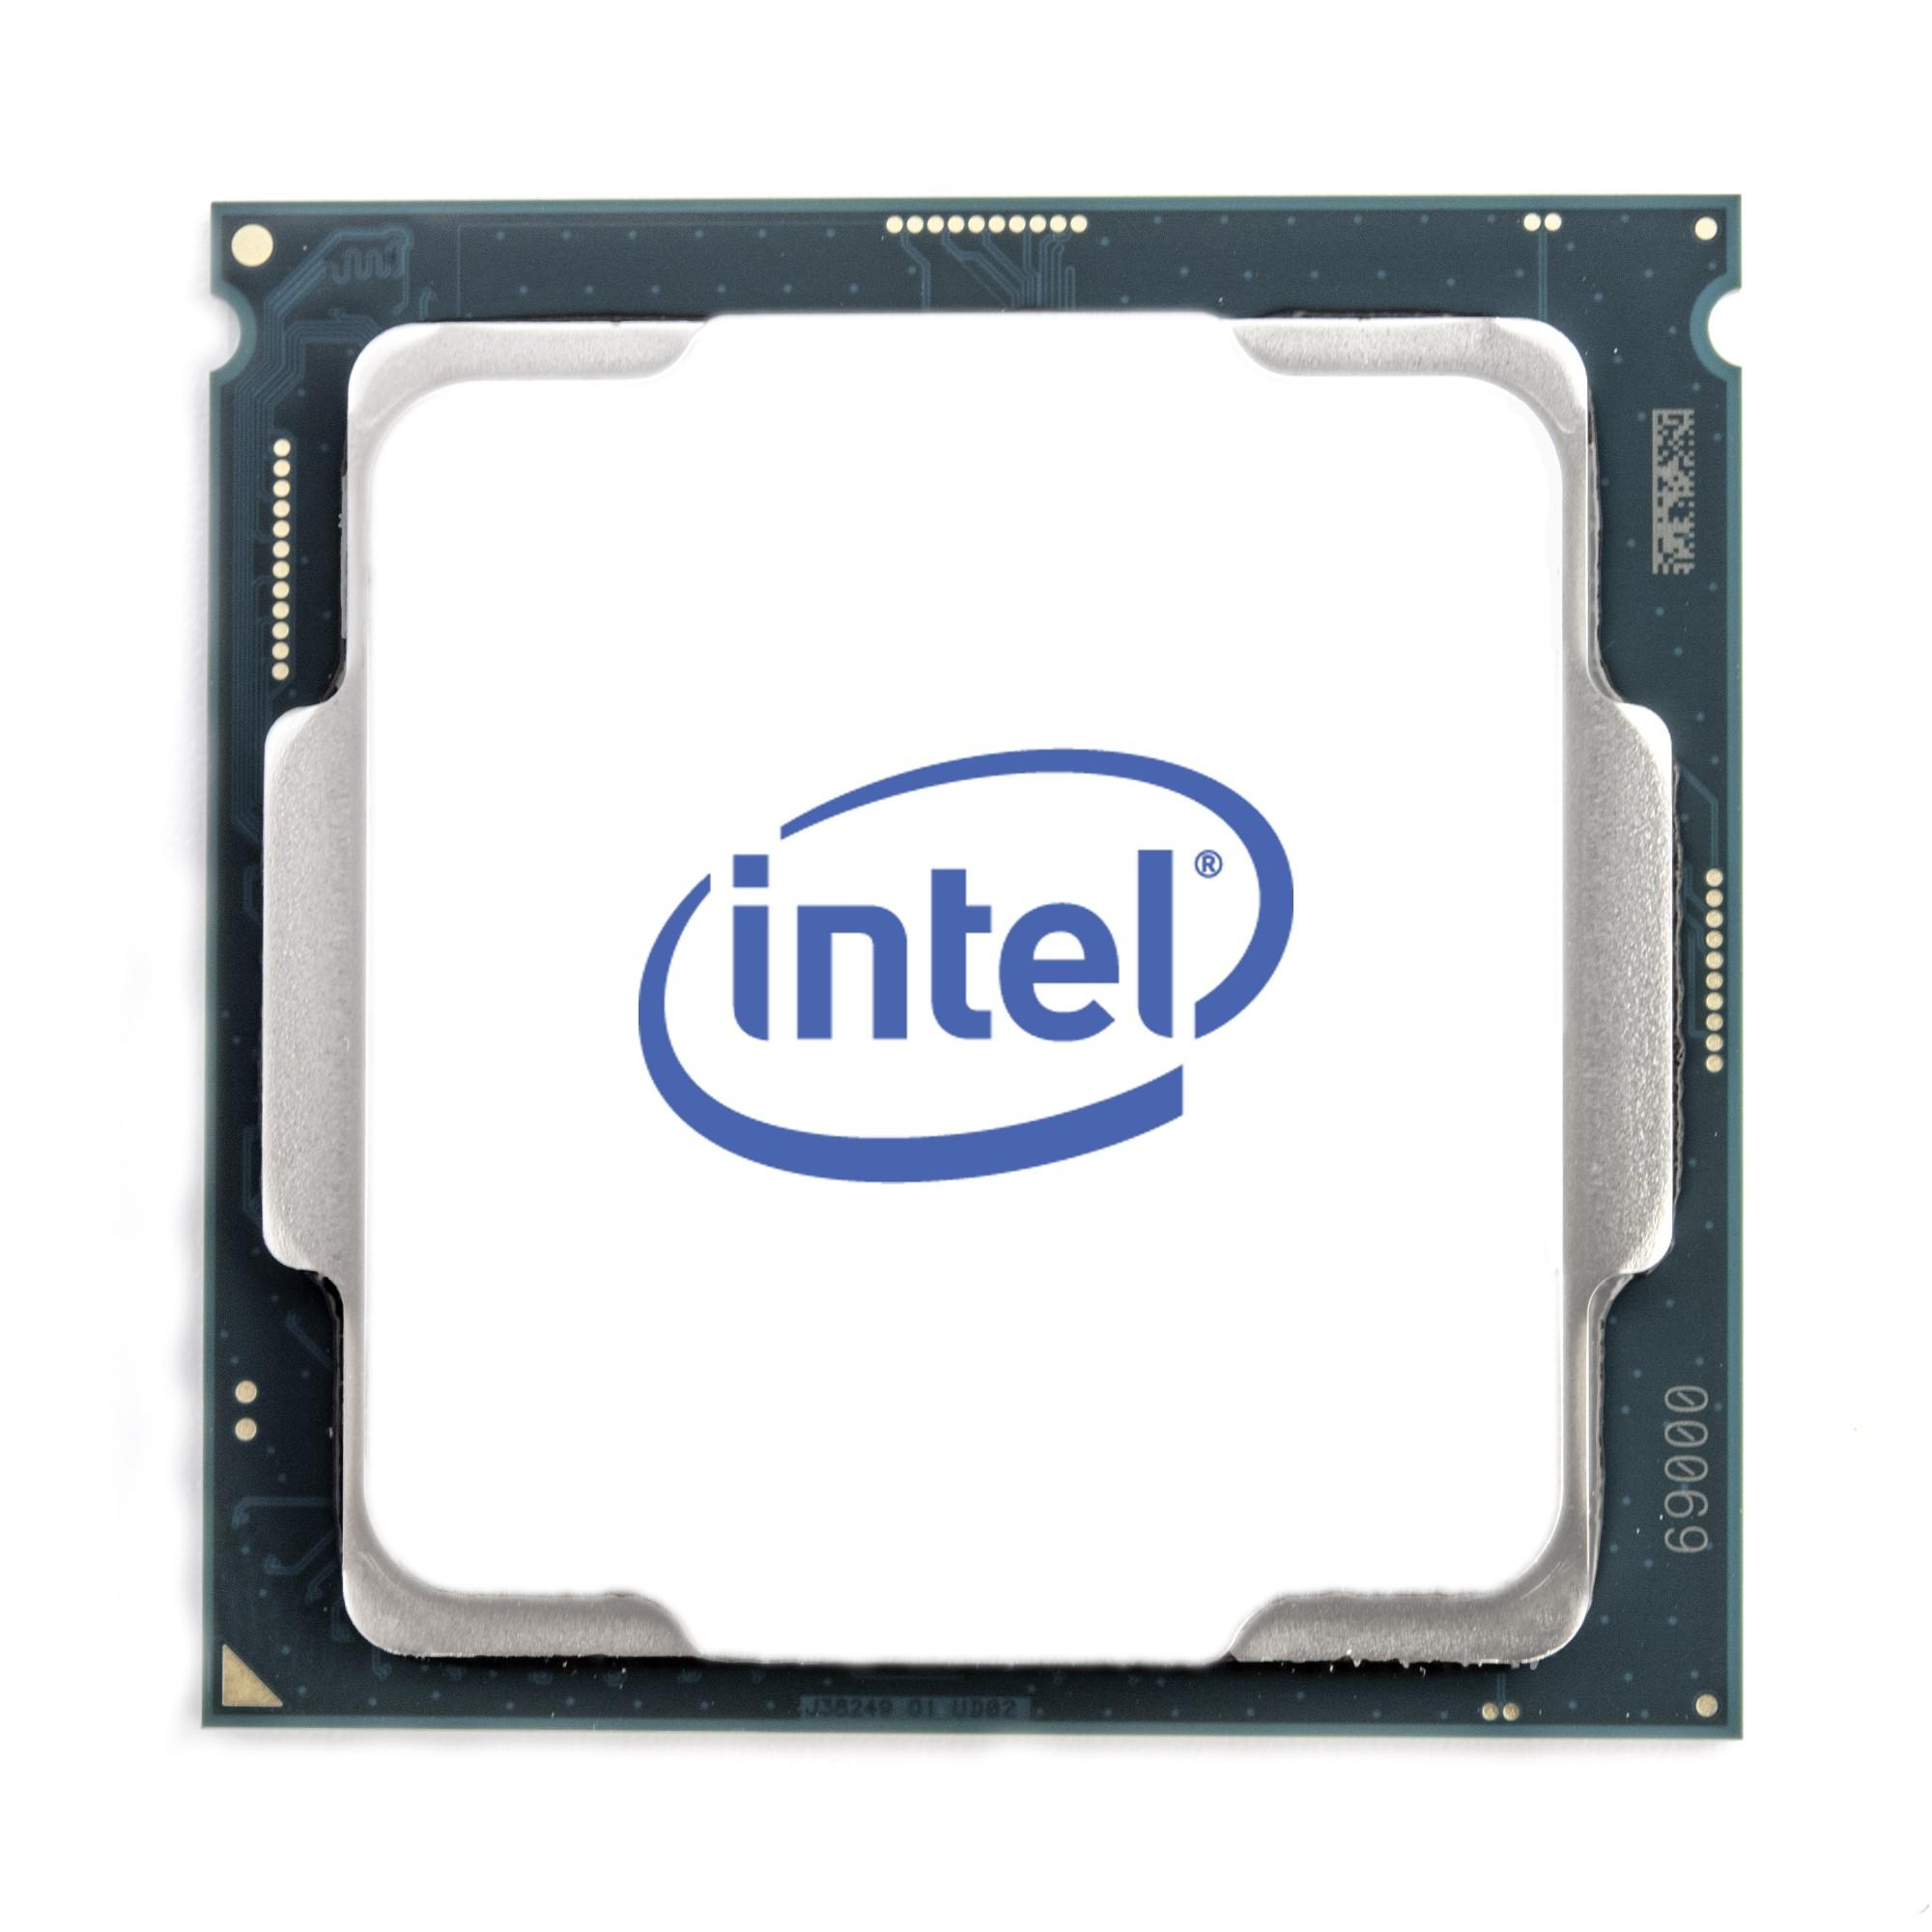 Intel Xeon 6244 processor 3.6 GHz 24.75 MB